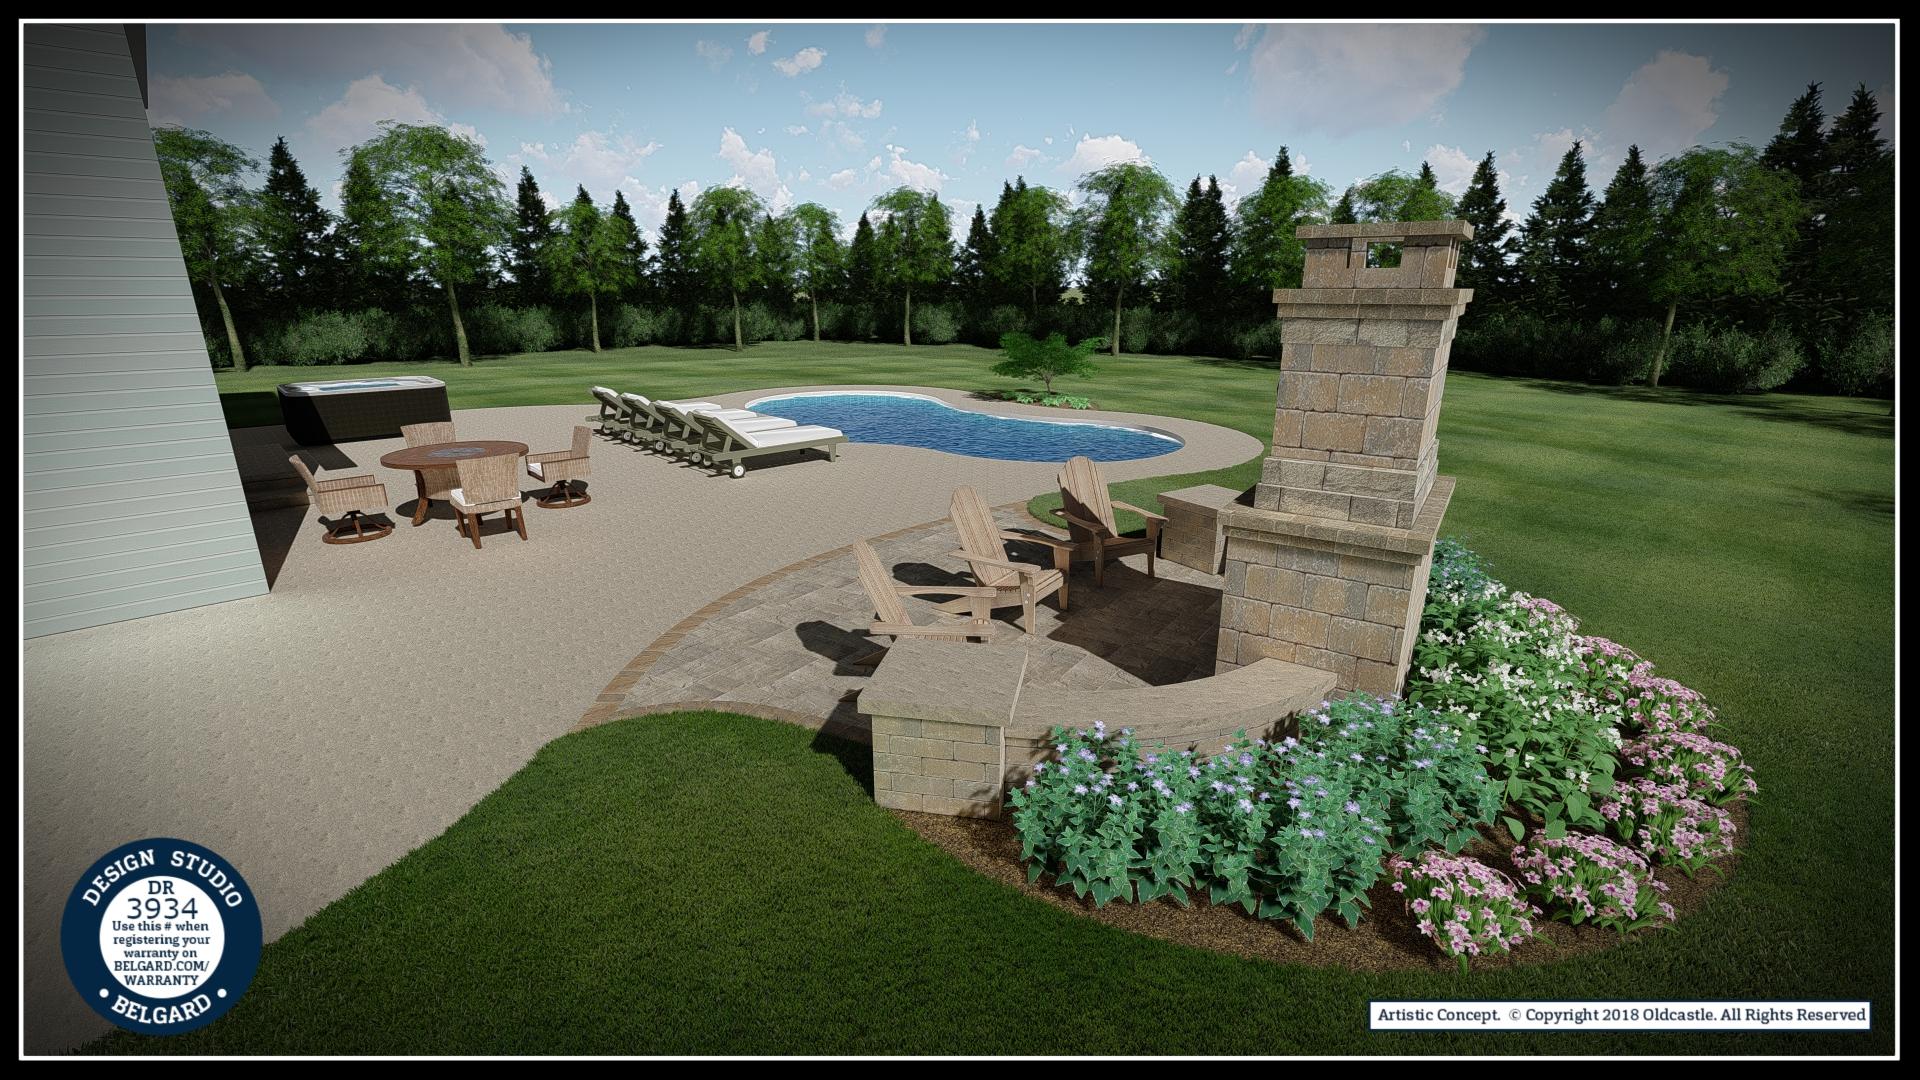 Vosters Landscaping | Pool Deck | Firepit | Brick | Hardscape | Outdoor Living | Patio | Belgard | Design Studio | Fireplace